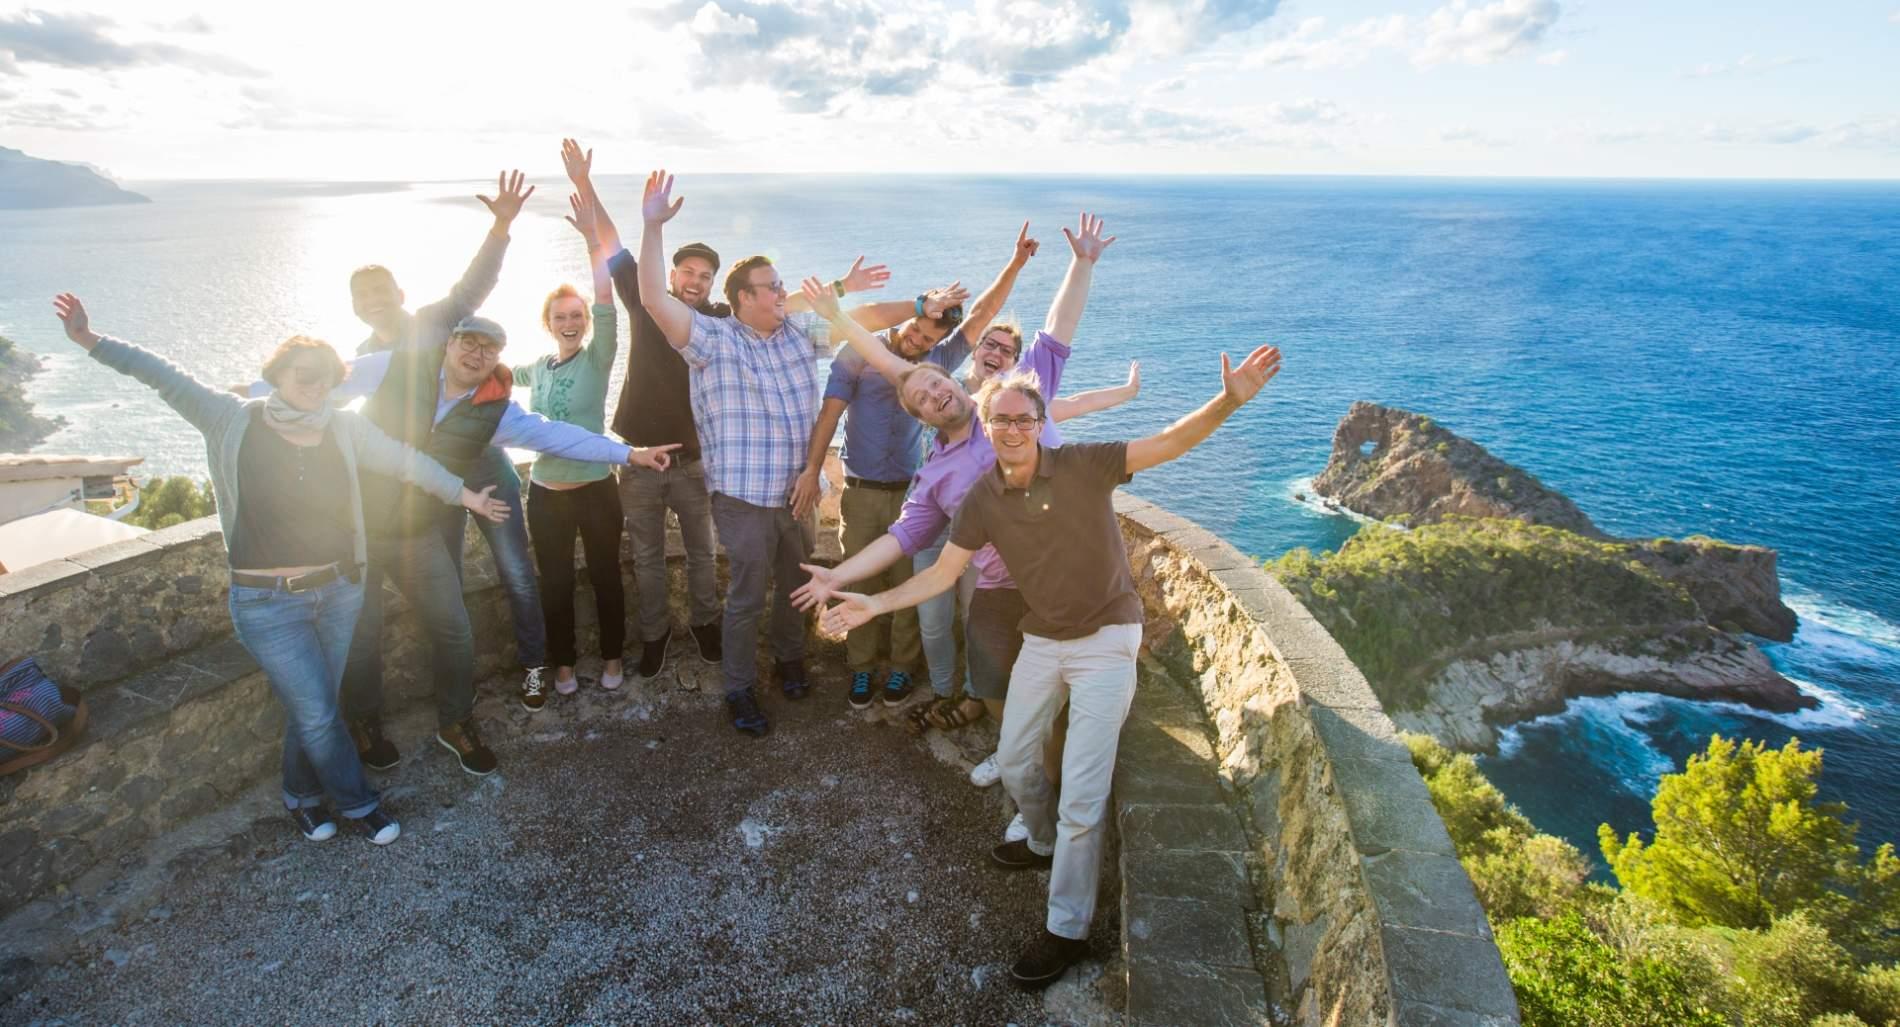 Tourismuszukunft Gruppenbild am Meer auf Mallorca